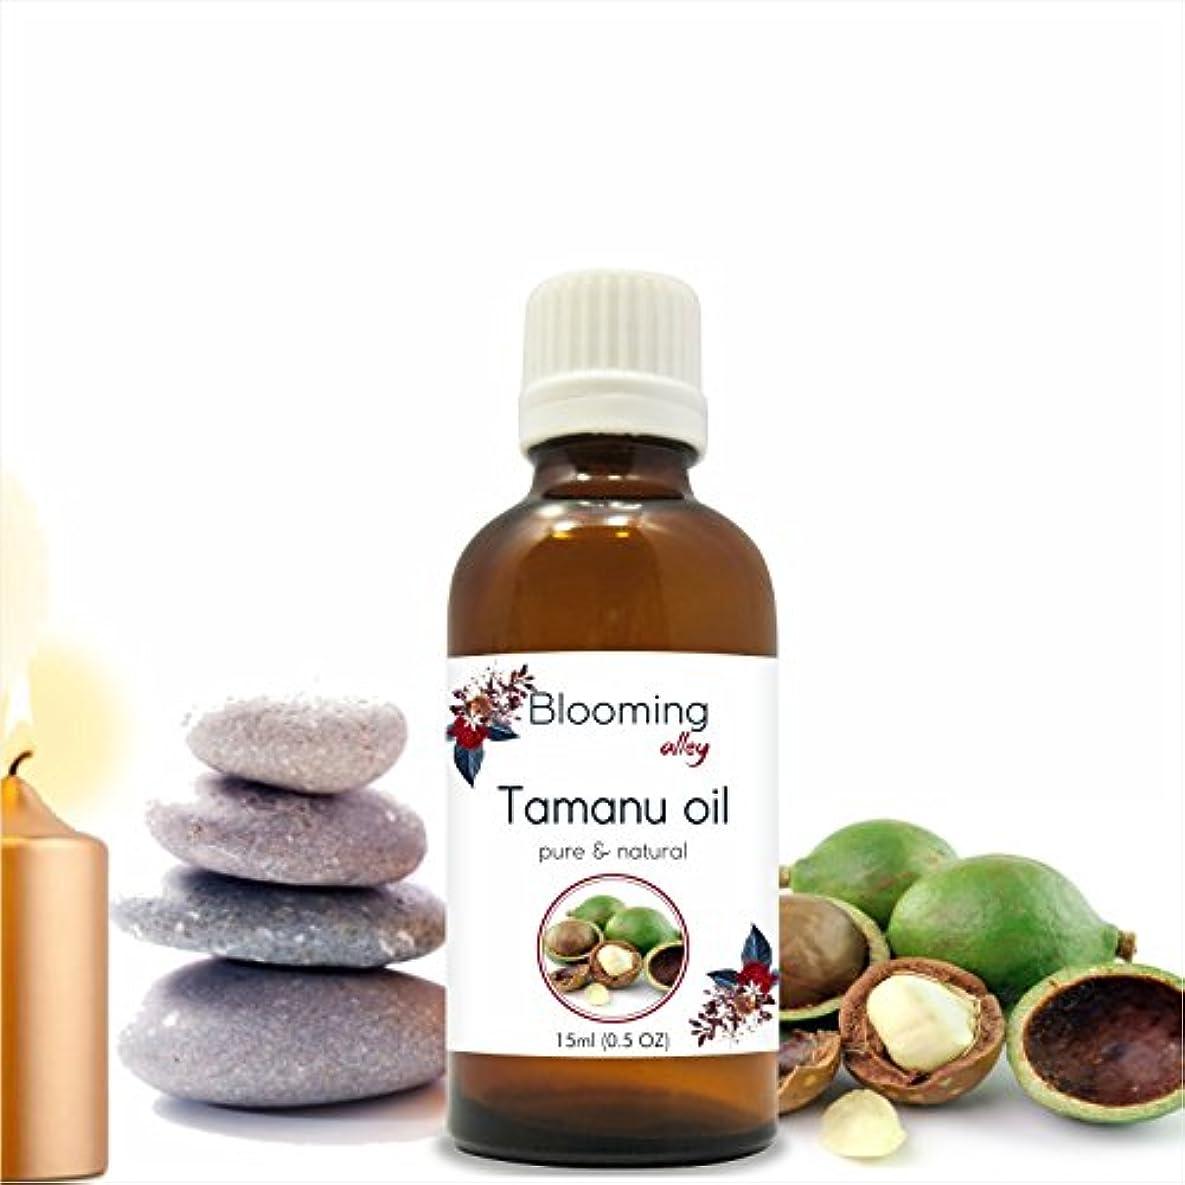 Tamanu Oil(Calophyllum Inophyllum) 15 ml or .50 Fl Oz by Blooming Alley